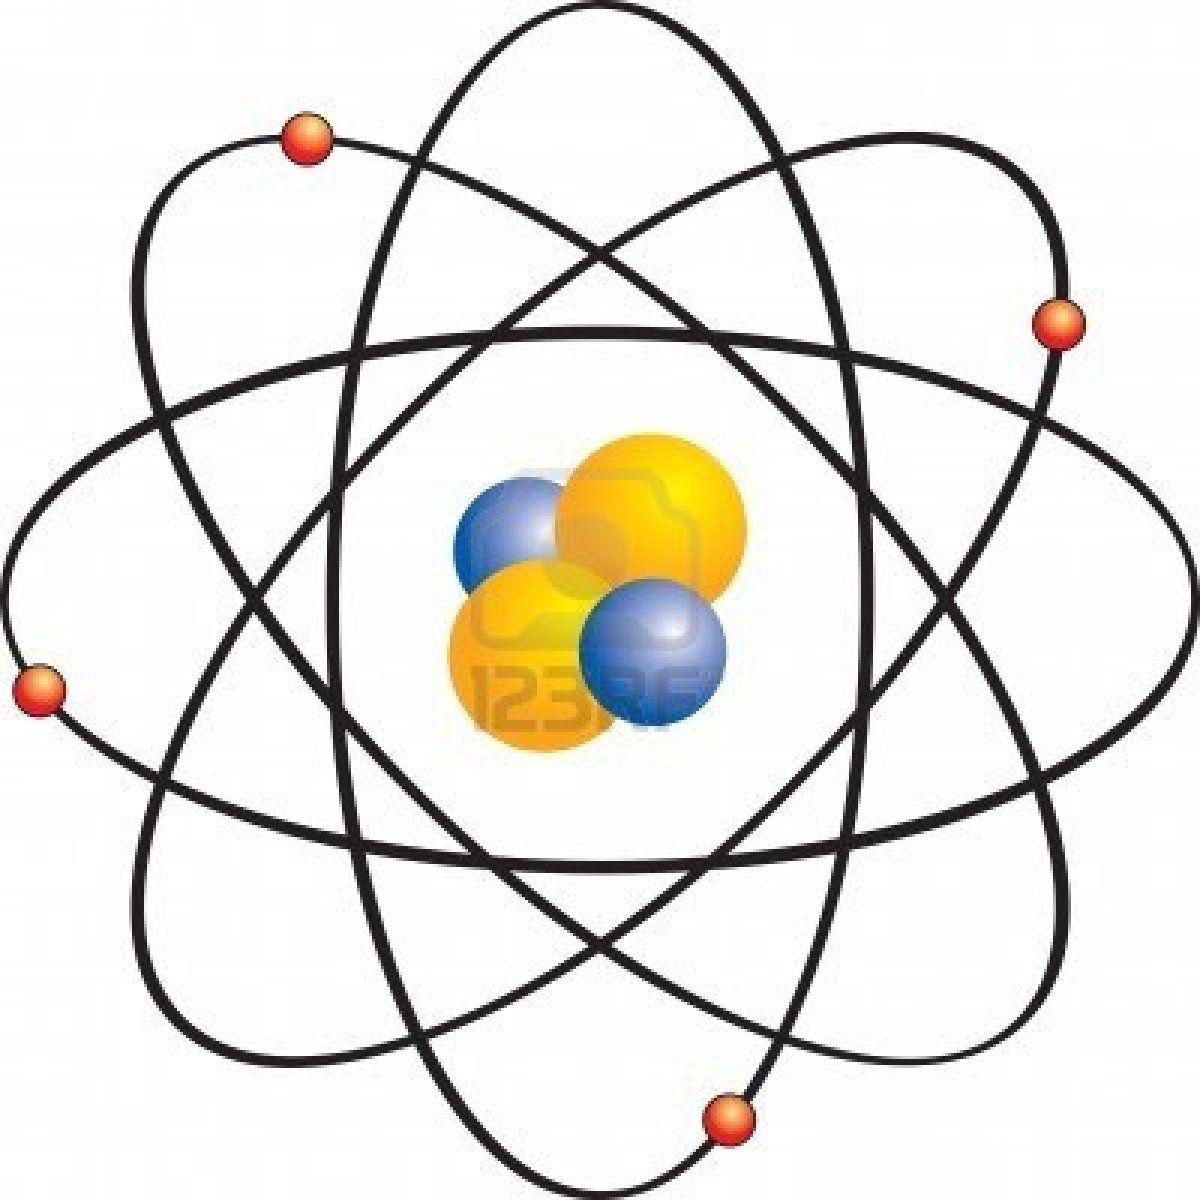 tunable laser applications � f2 bohr diagram: neucleus-electrons buzz  around neucleus-sort of orbit/jump